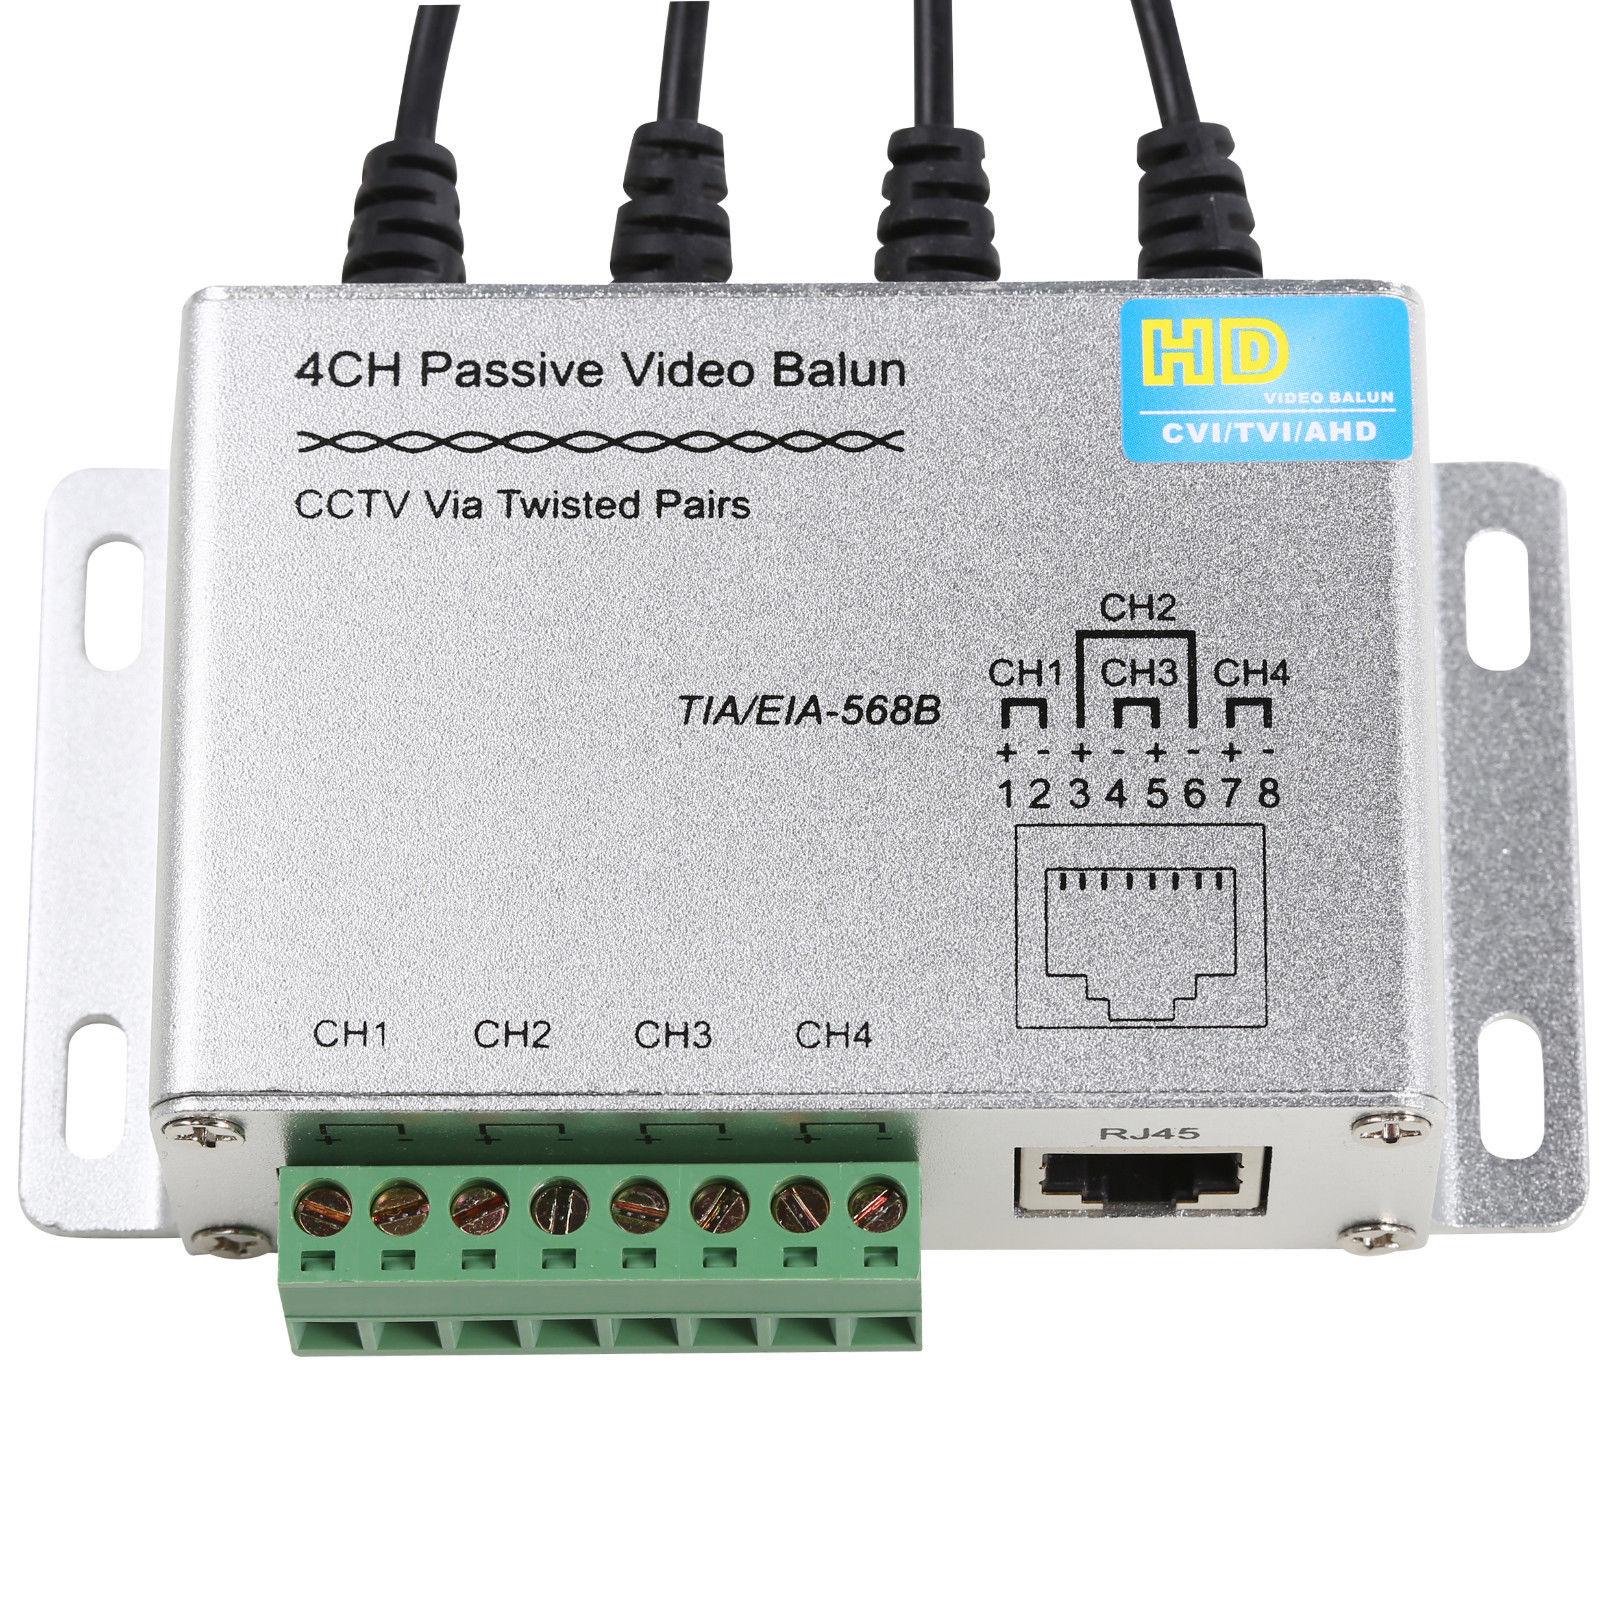 4CH HD CVI/TVI/AHD Passive Video Balun BNC Male RJ45 UTP CCTV Via Twisted Pairs press fitterminal upside the balun for easier installation color video hd cvi tvi 720p up 300m with passive receiver